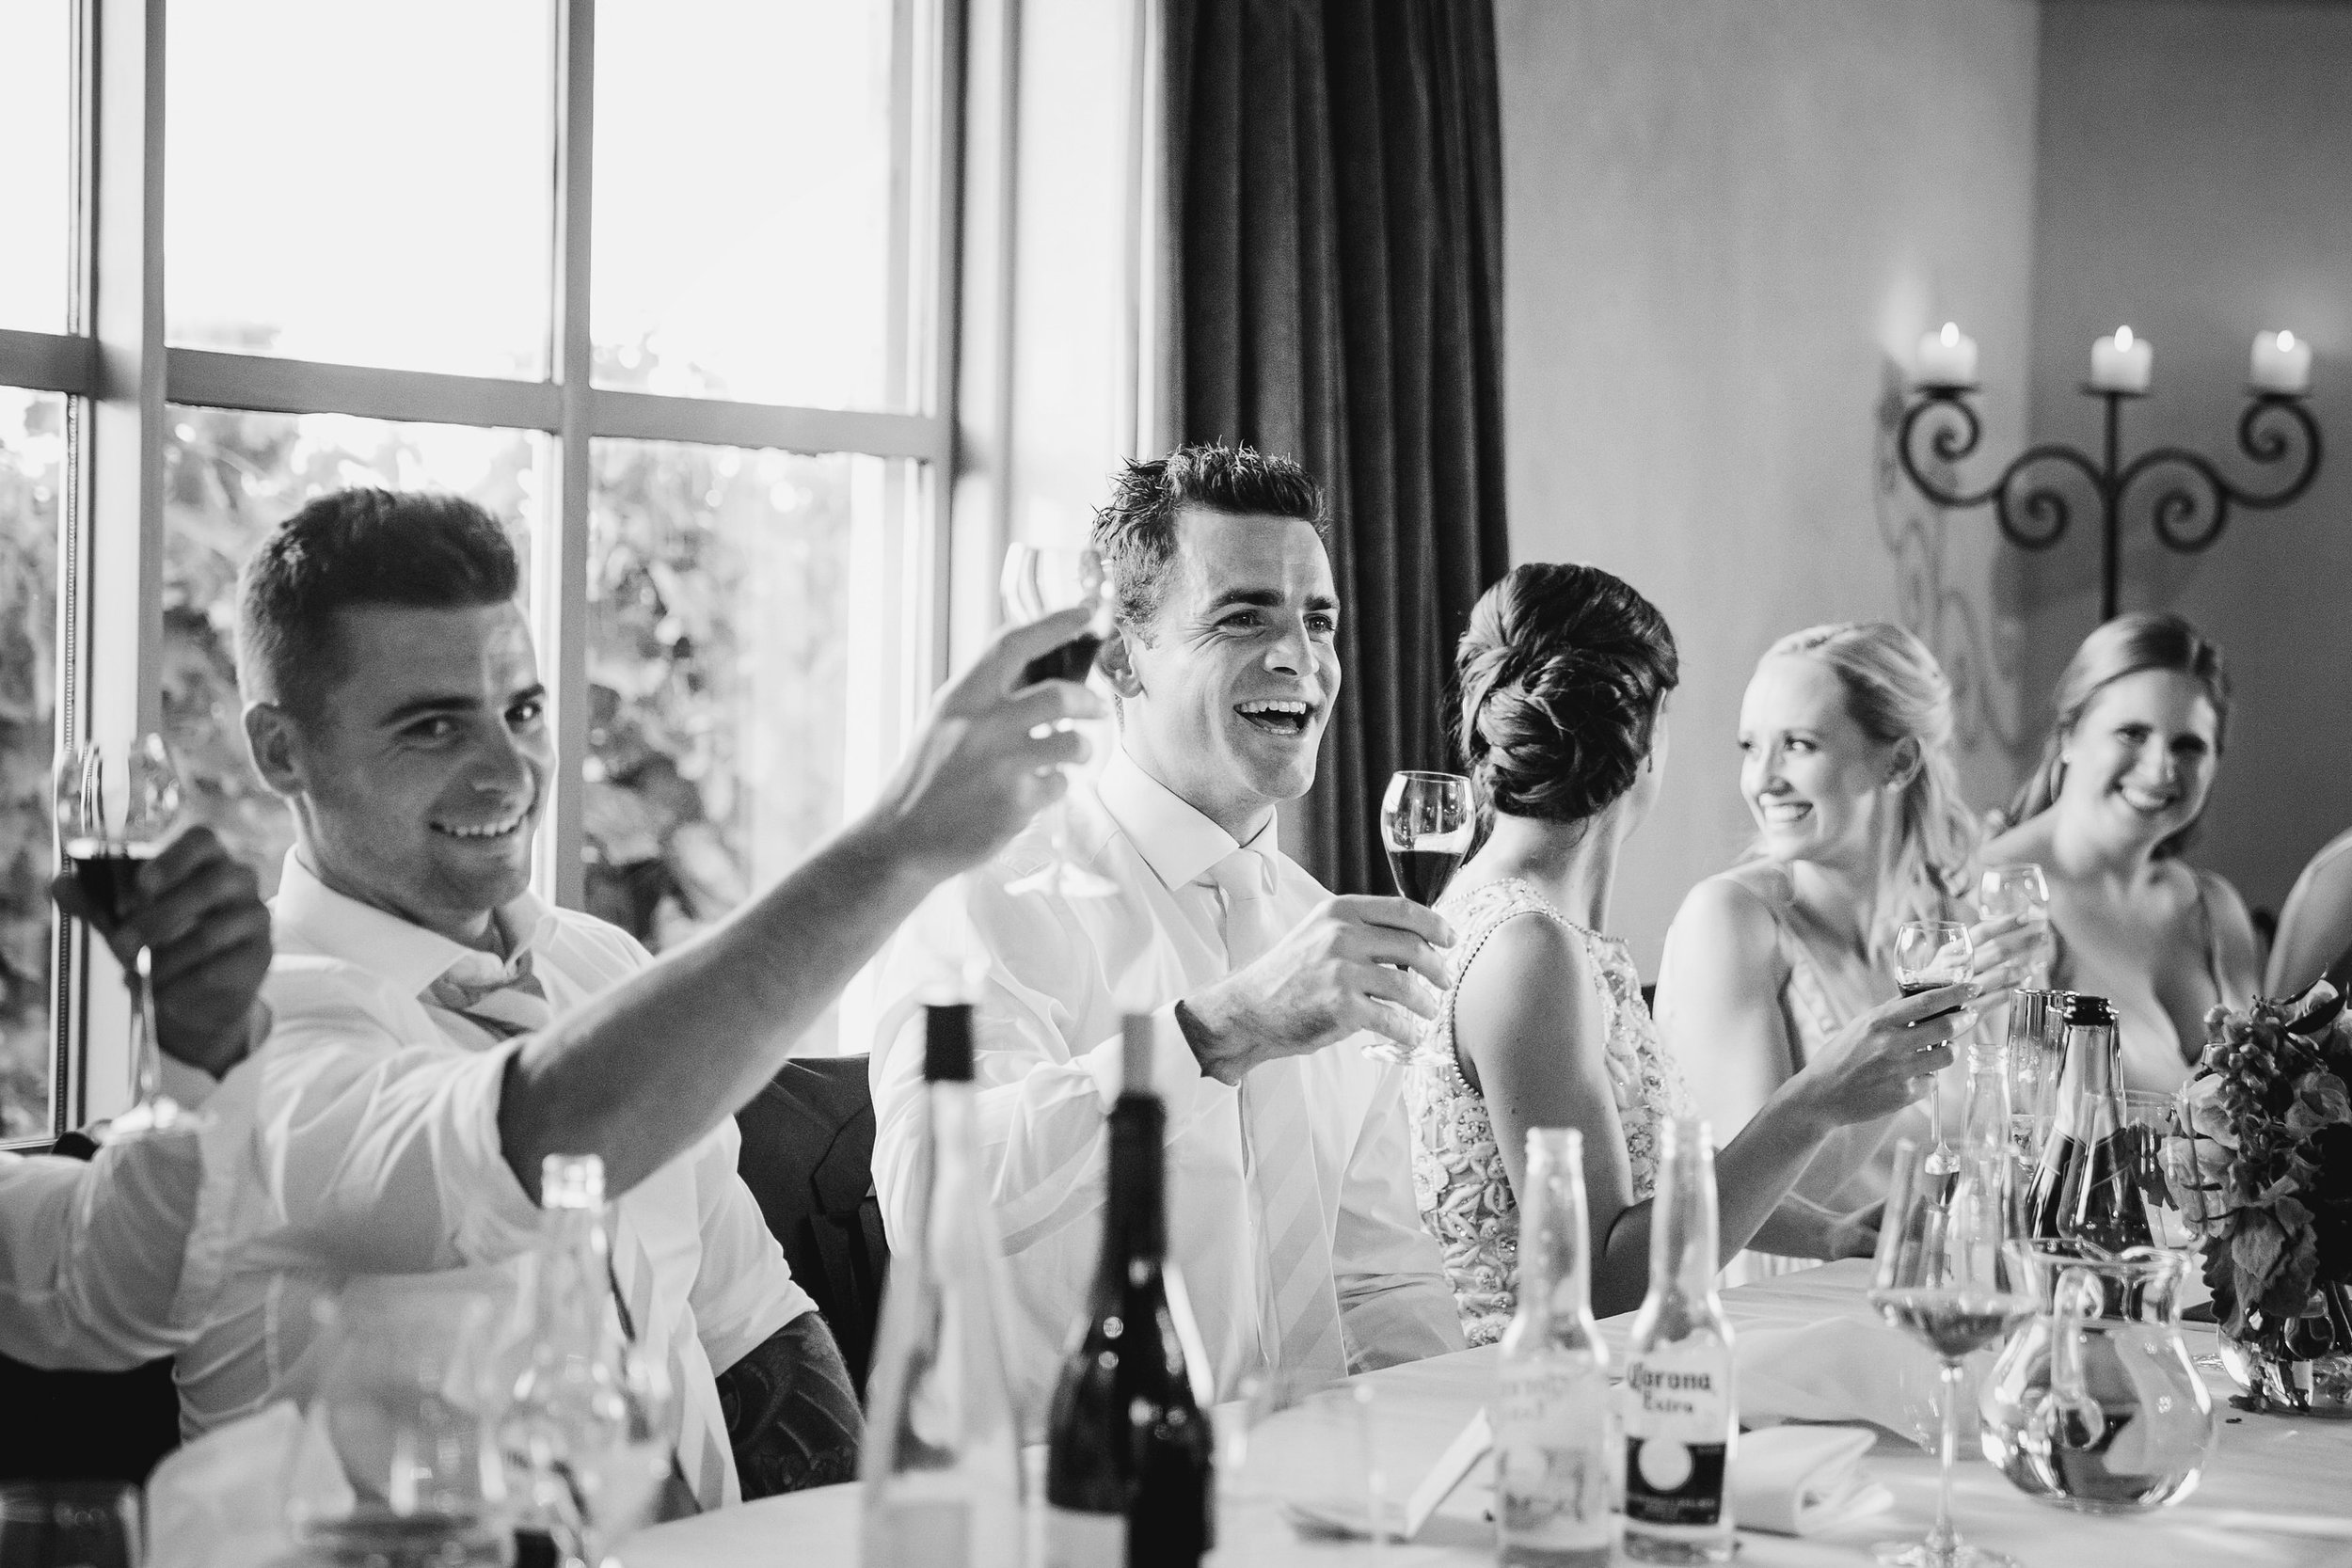 Martinborough-Poppies-Wedding-Caine-Eloise-Toni-Larsen-0150.jpg